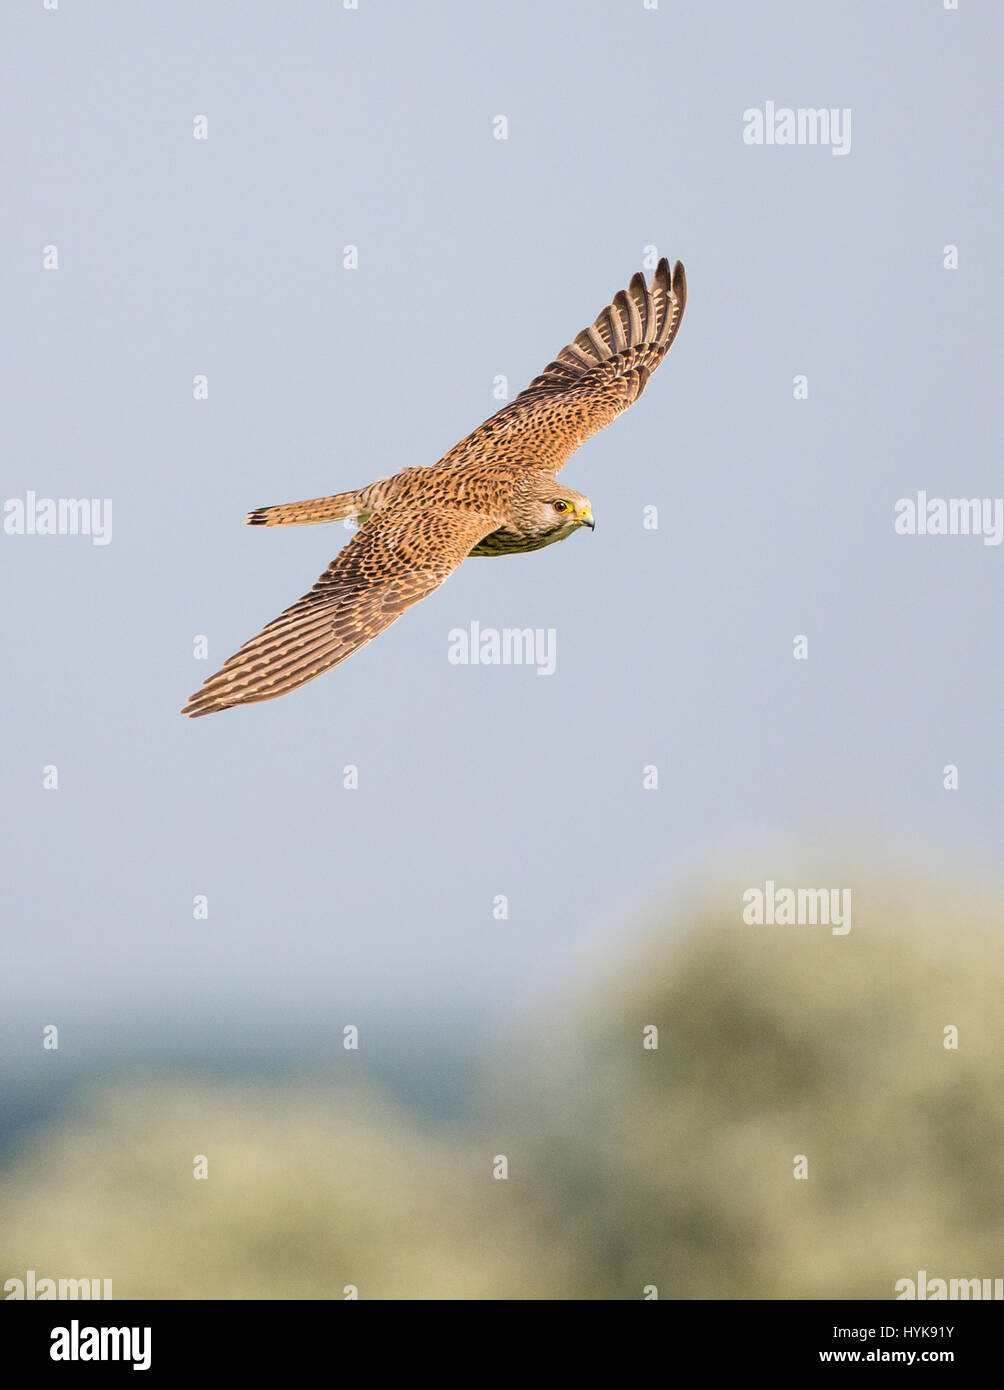 Female Common Kestrel (Falco tinnunculus) in flight - Stock Image